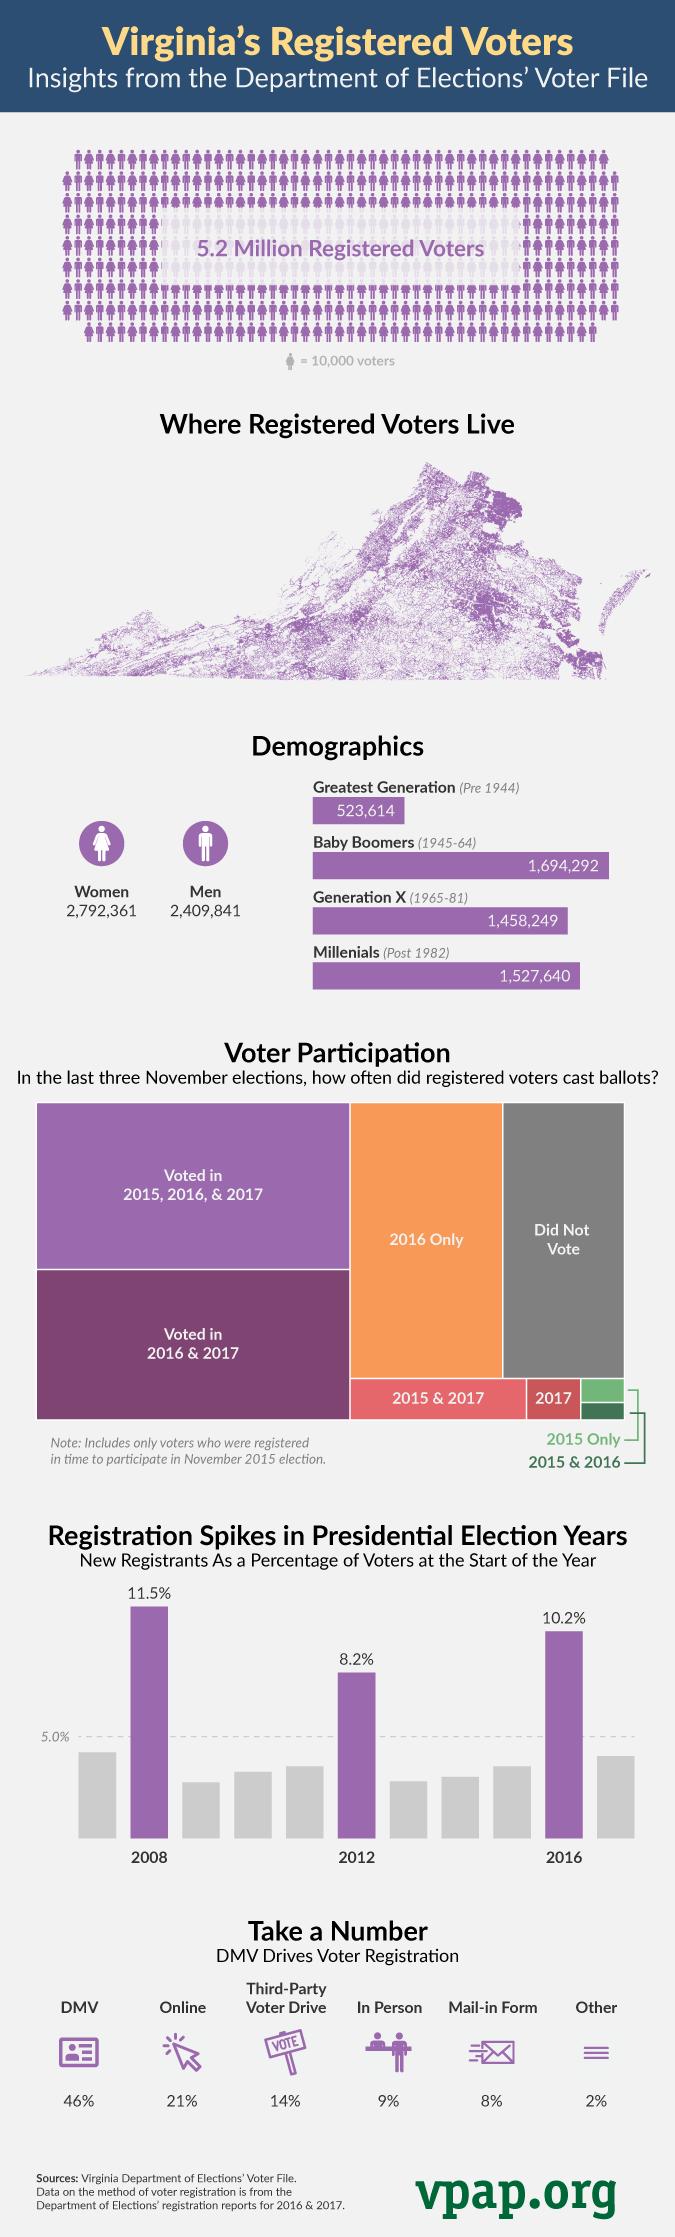 Virginia's Registered Voters